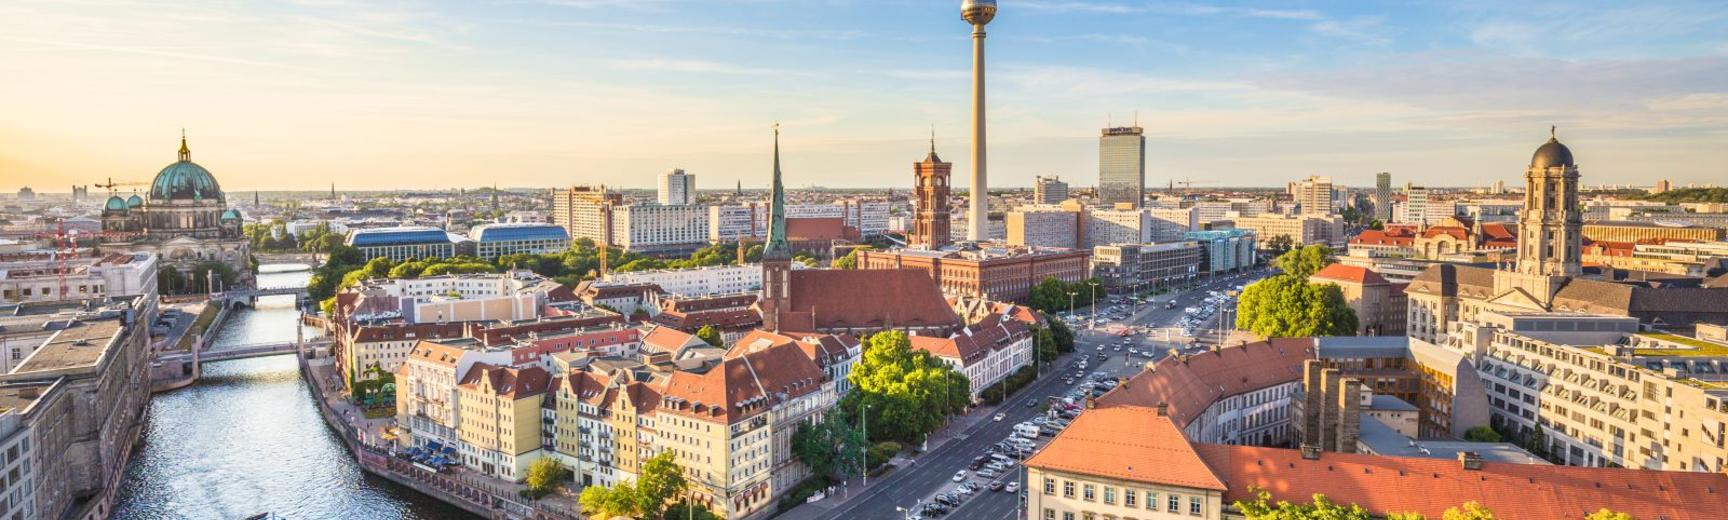 Oxford Berlin research partnership